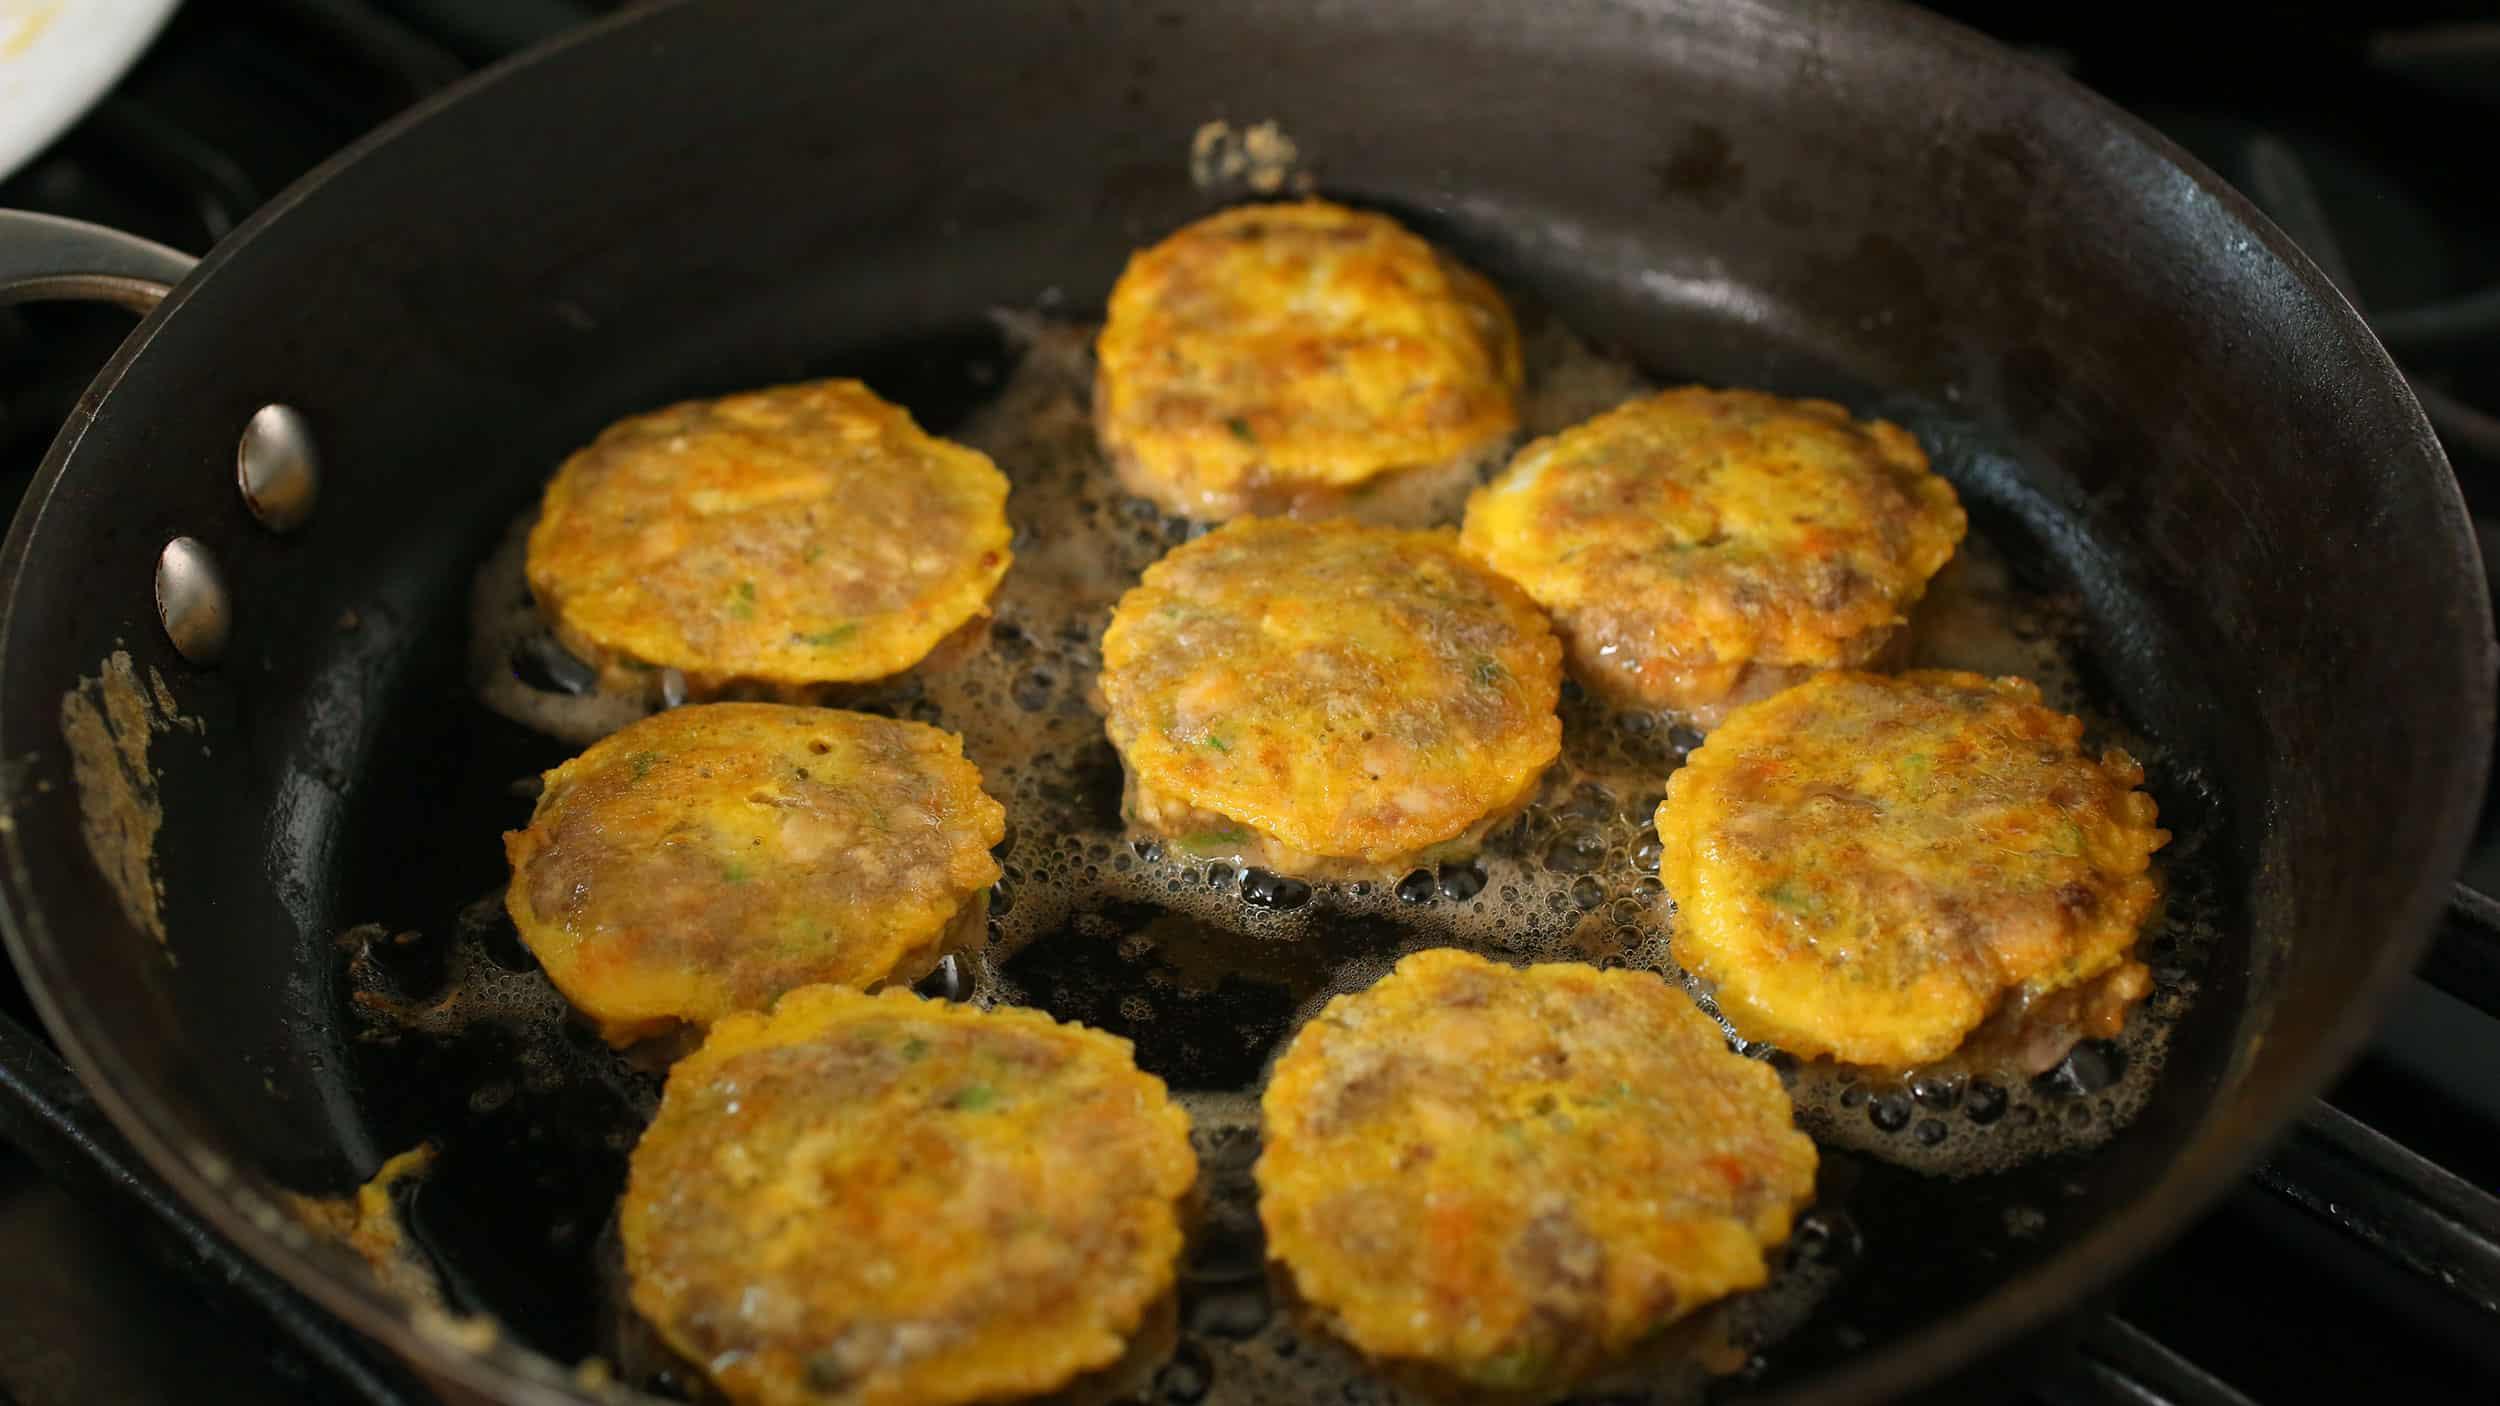 Pan Fried Meat And Tofu Patties Wanja Jeon Recipe